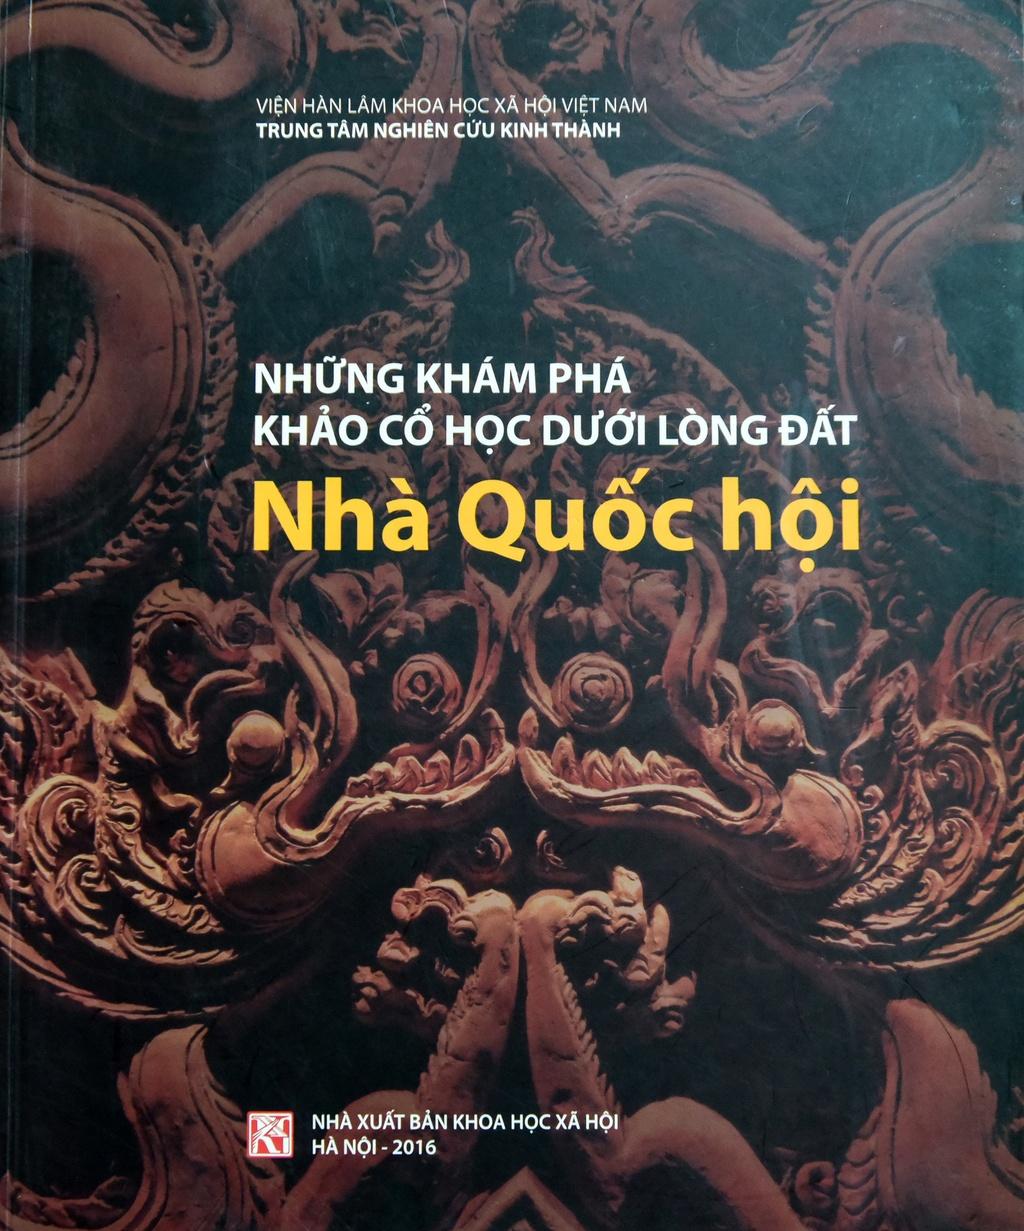 Kham pha long dat Nha Quoc hoi anh 2